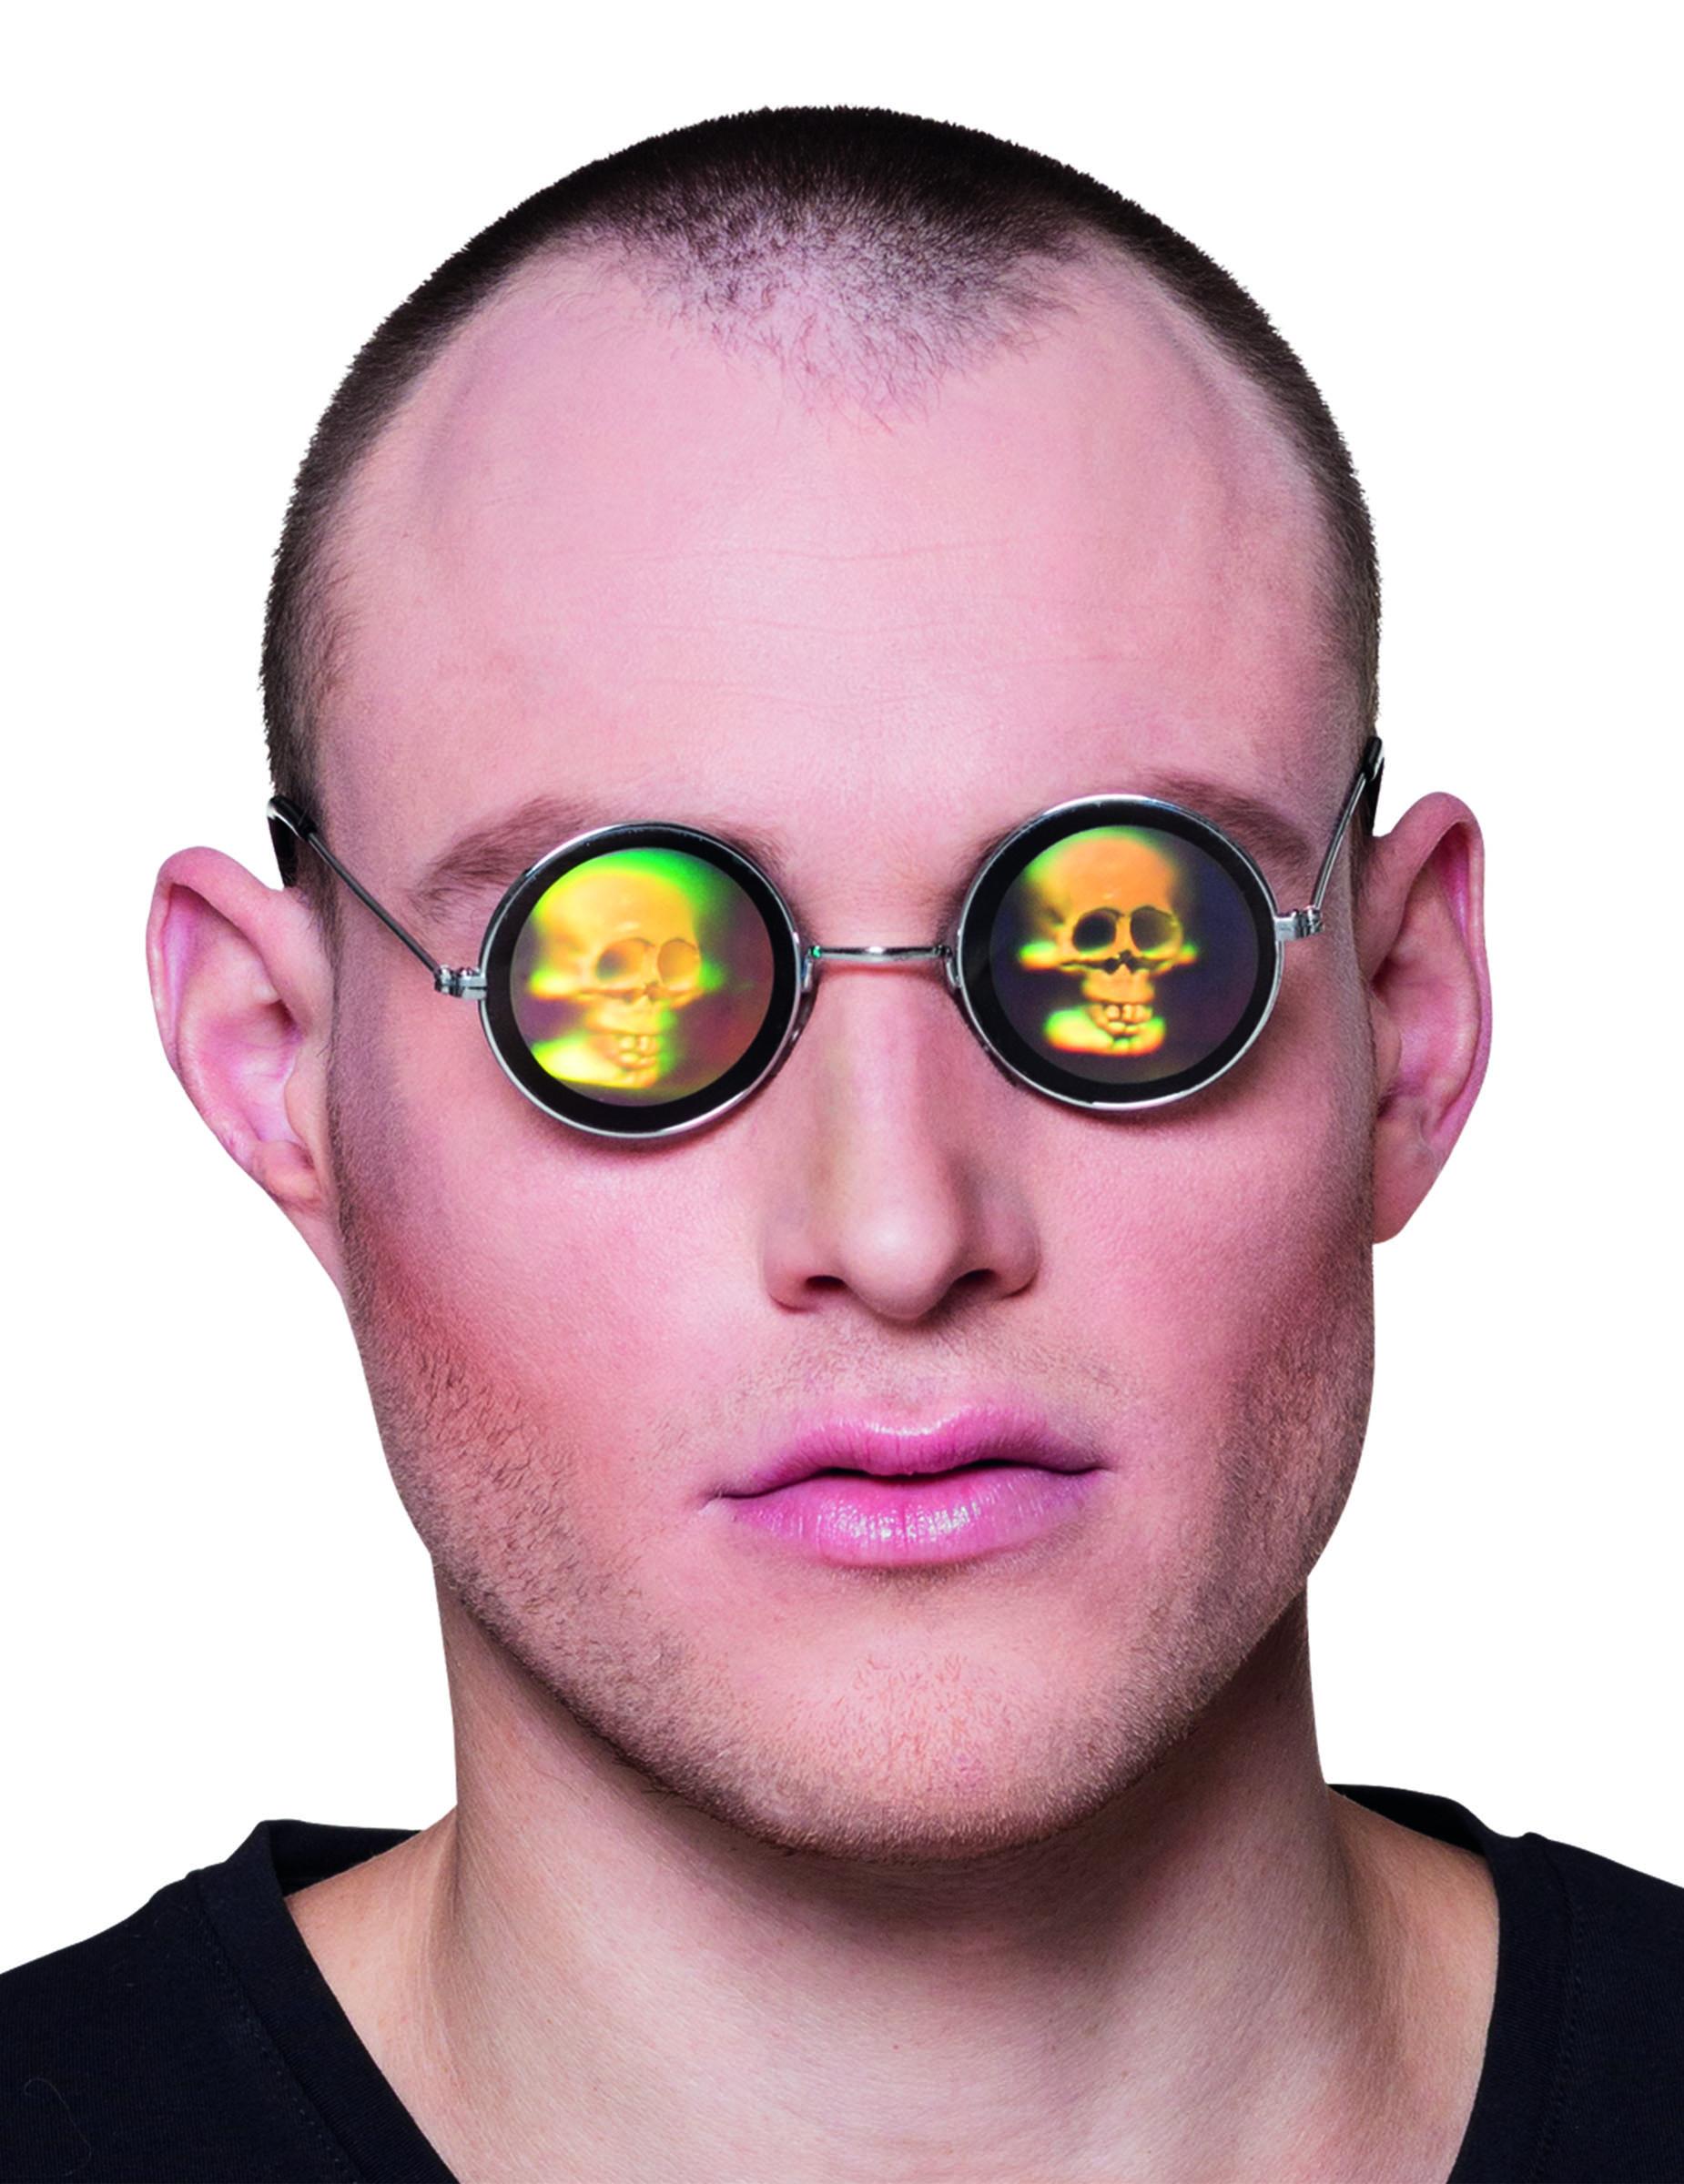 lunettes m tal rondes avec hologramme t te de mort. Black Bedroom Furniture Sets. Home Design Ideas